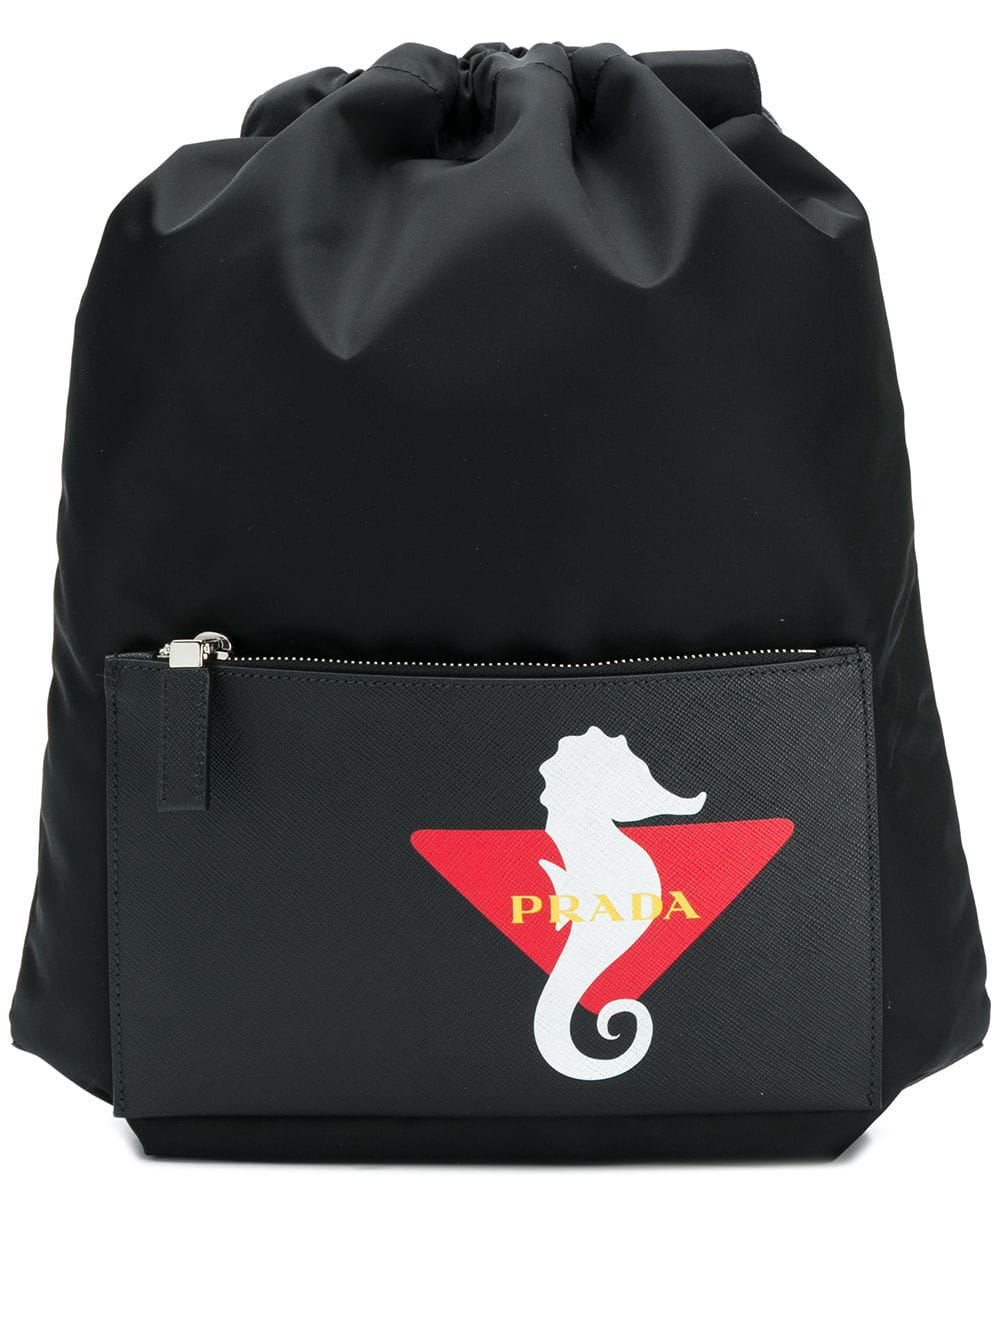 3d4c6157b492 Prada Logo Print Drawstring Backpack - Black | ModeSens